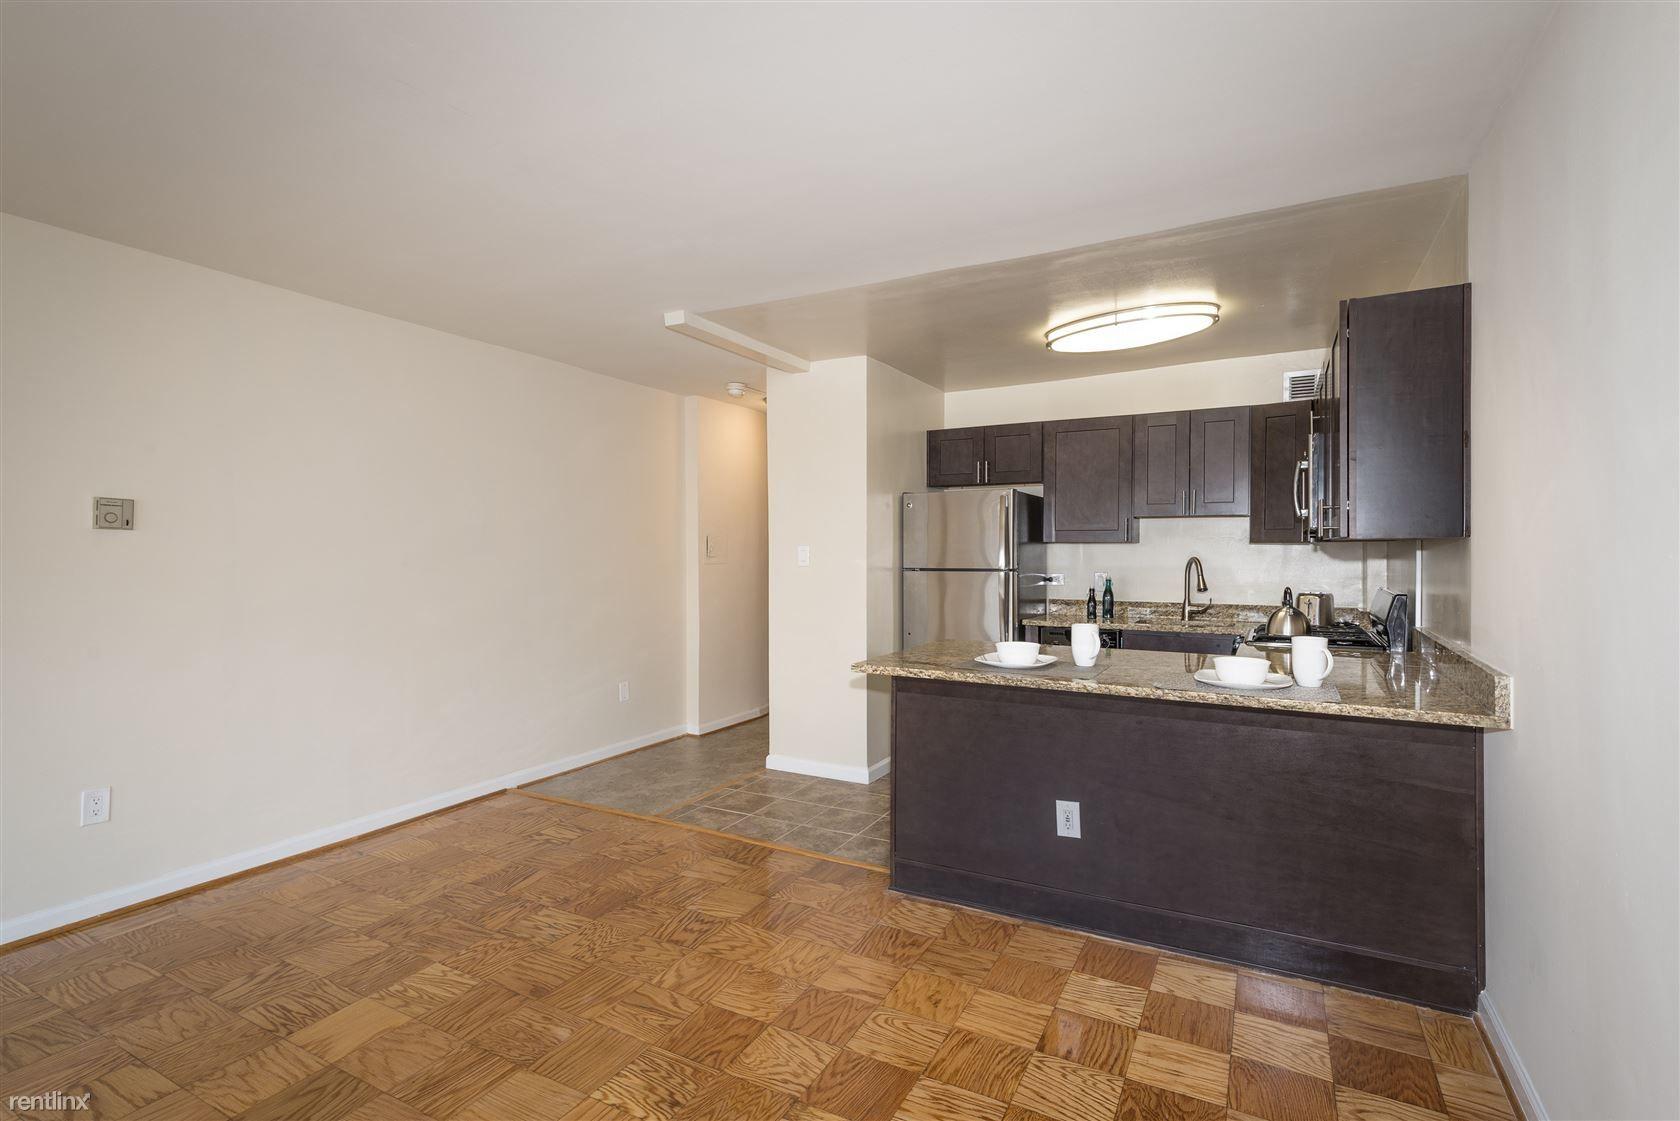 2400 Pennsylvania Avenue Apartments rental